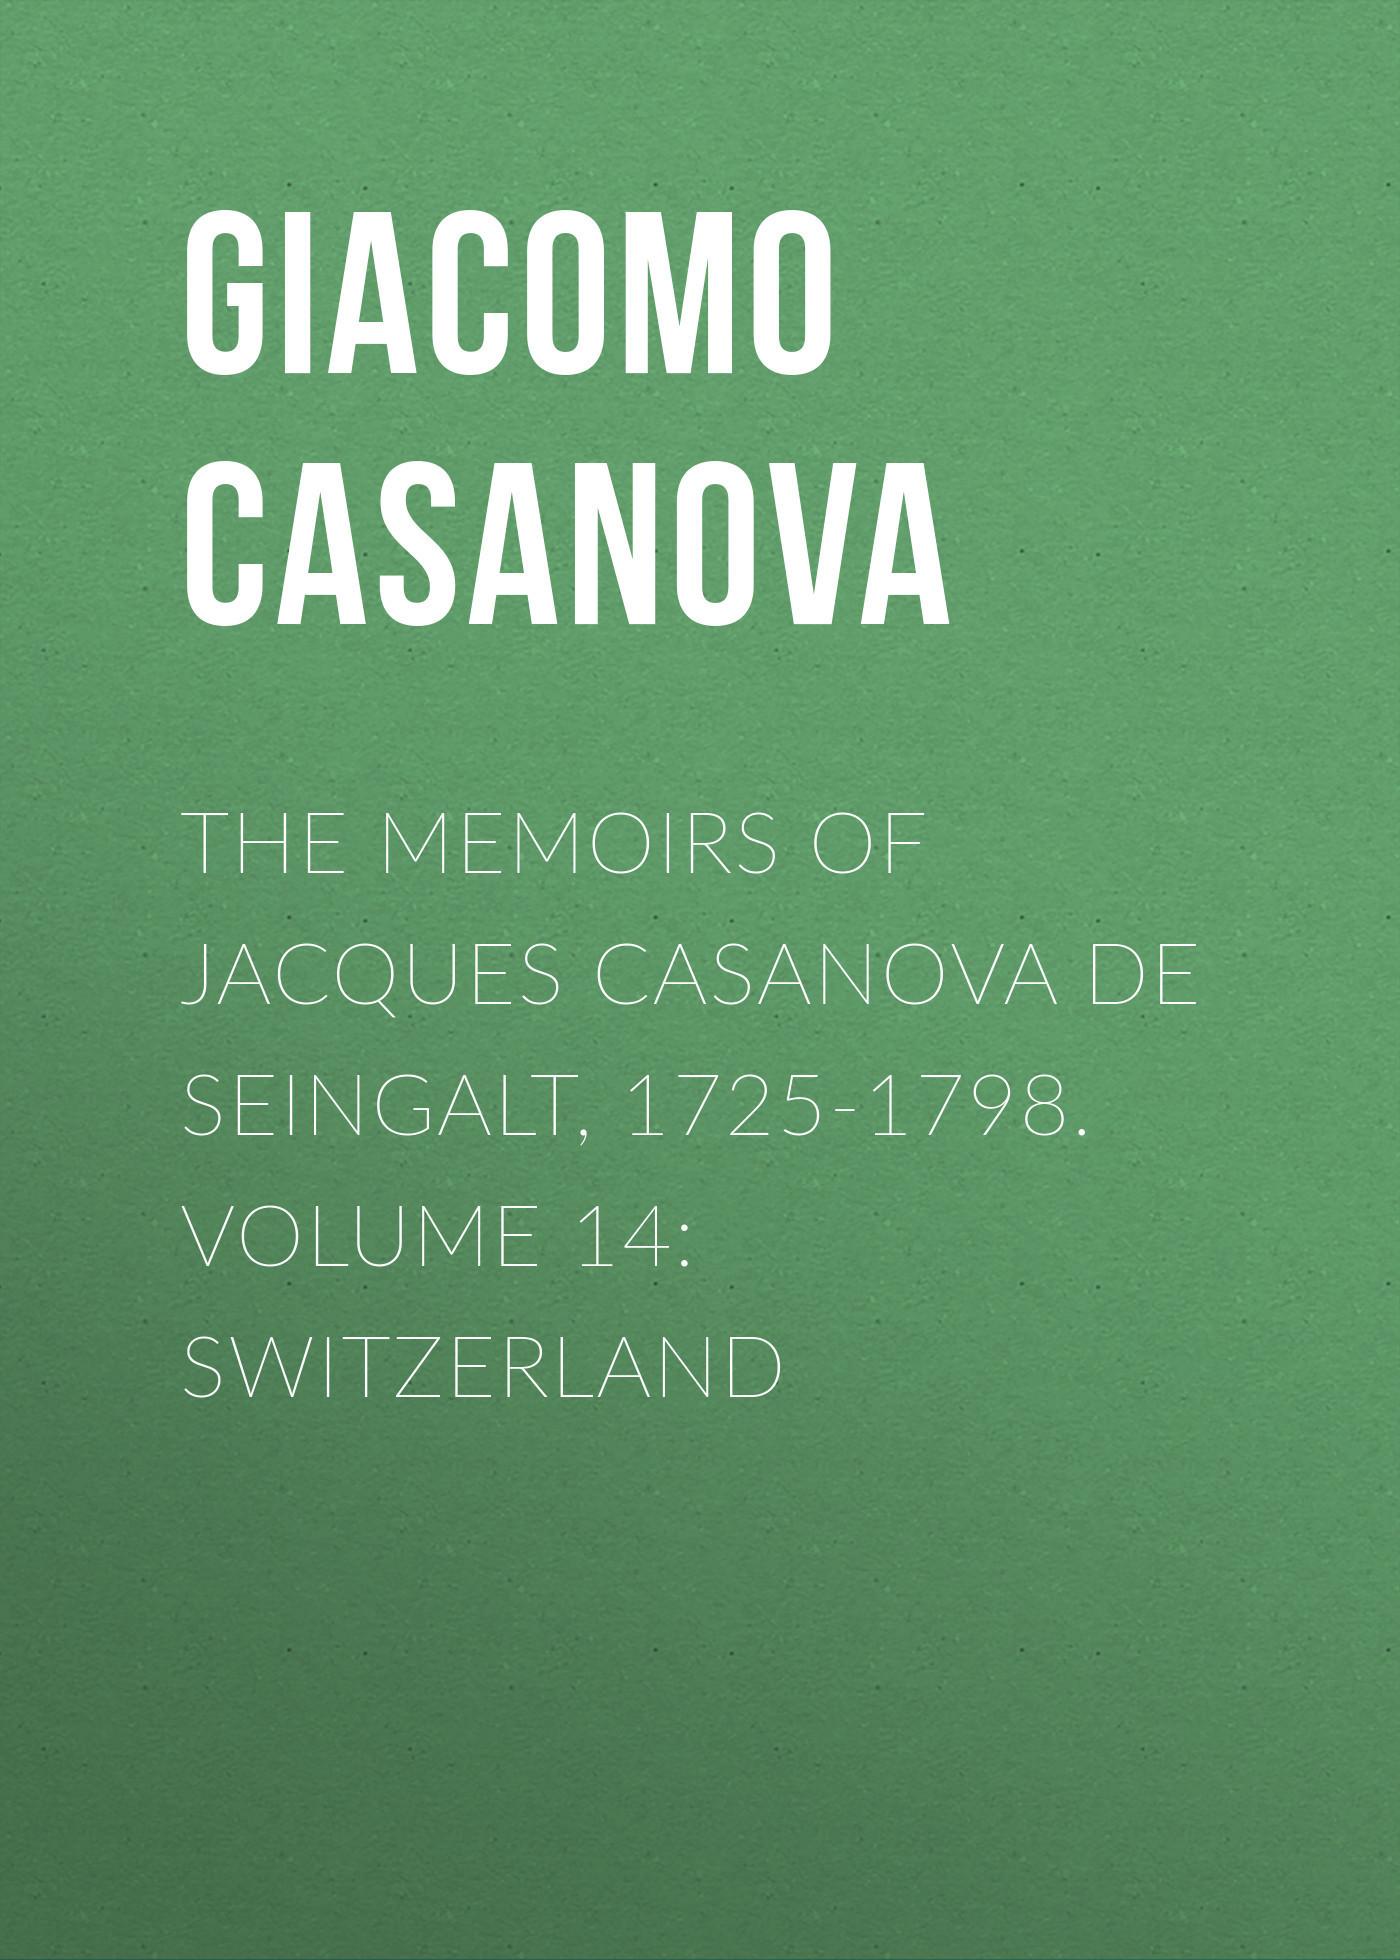 Giacomo Casanova The Memoirs of Jacques Casanova de Seingalt, 1725-1798. Volume 14: Switzerland giacomo casanova the memoirs of jacques casanova de seingalt 1725 1798 volume 17 return to italy